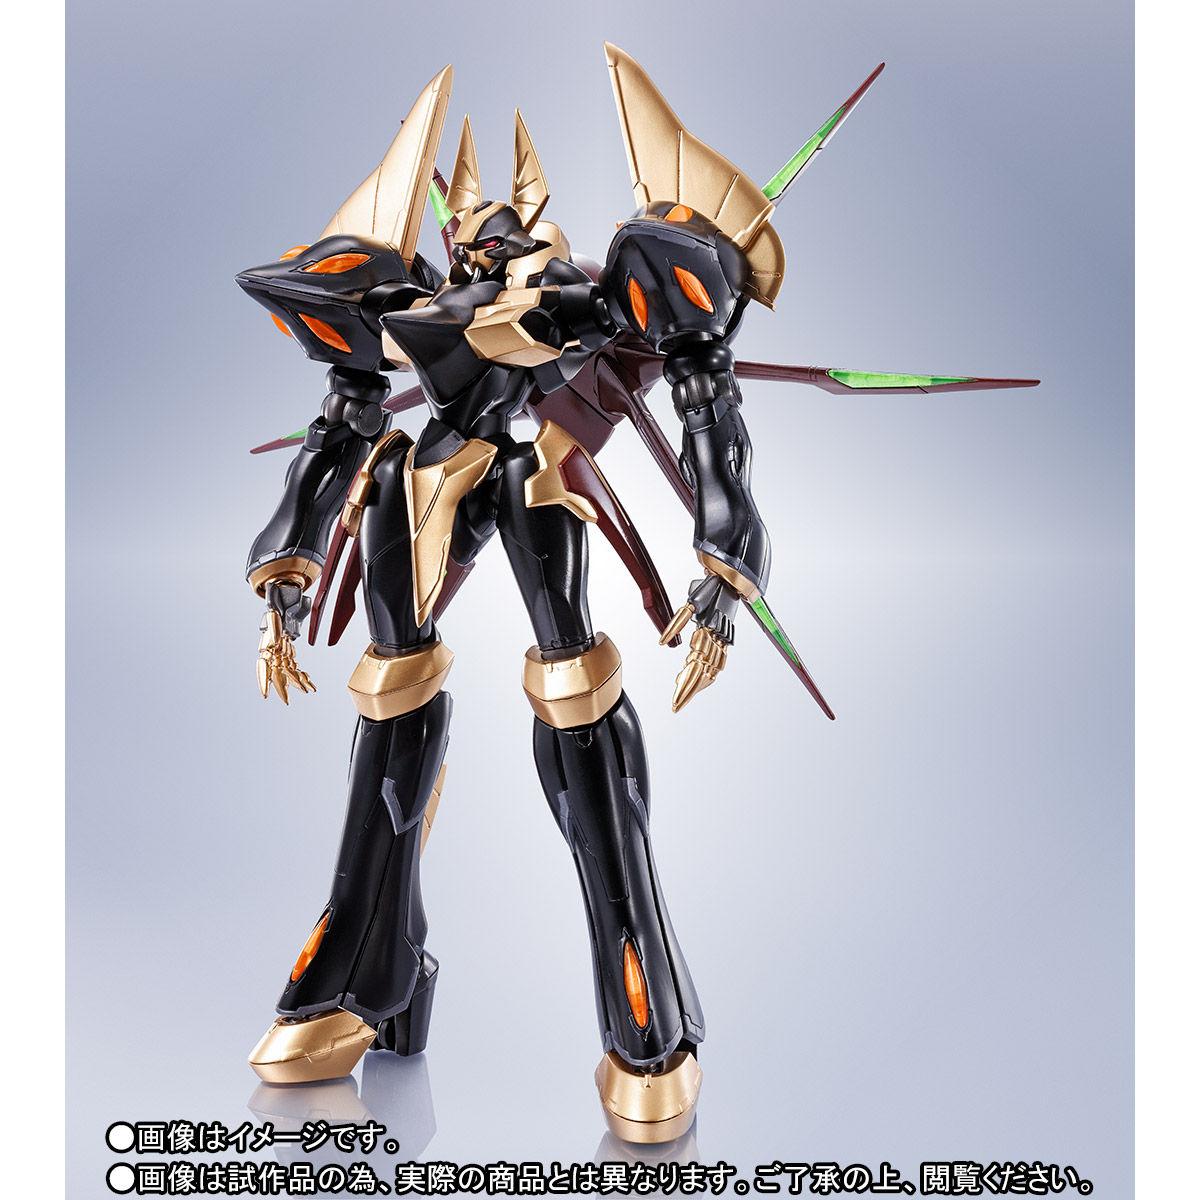 ROBOT魂〈SIDE KMF〉『ガウェイン ~BLACK REBELLION~』コードギアス 可動フィギュア-002